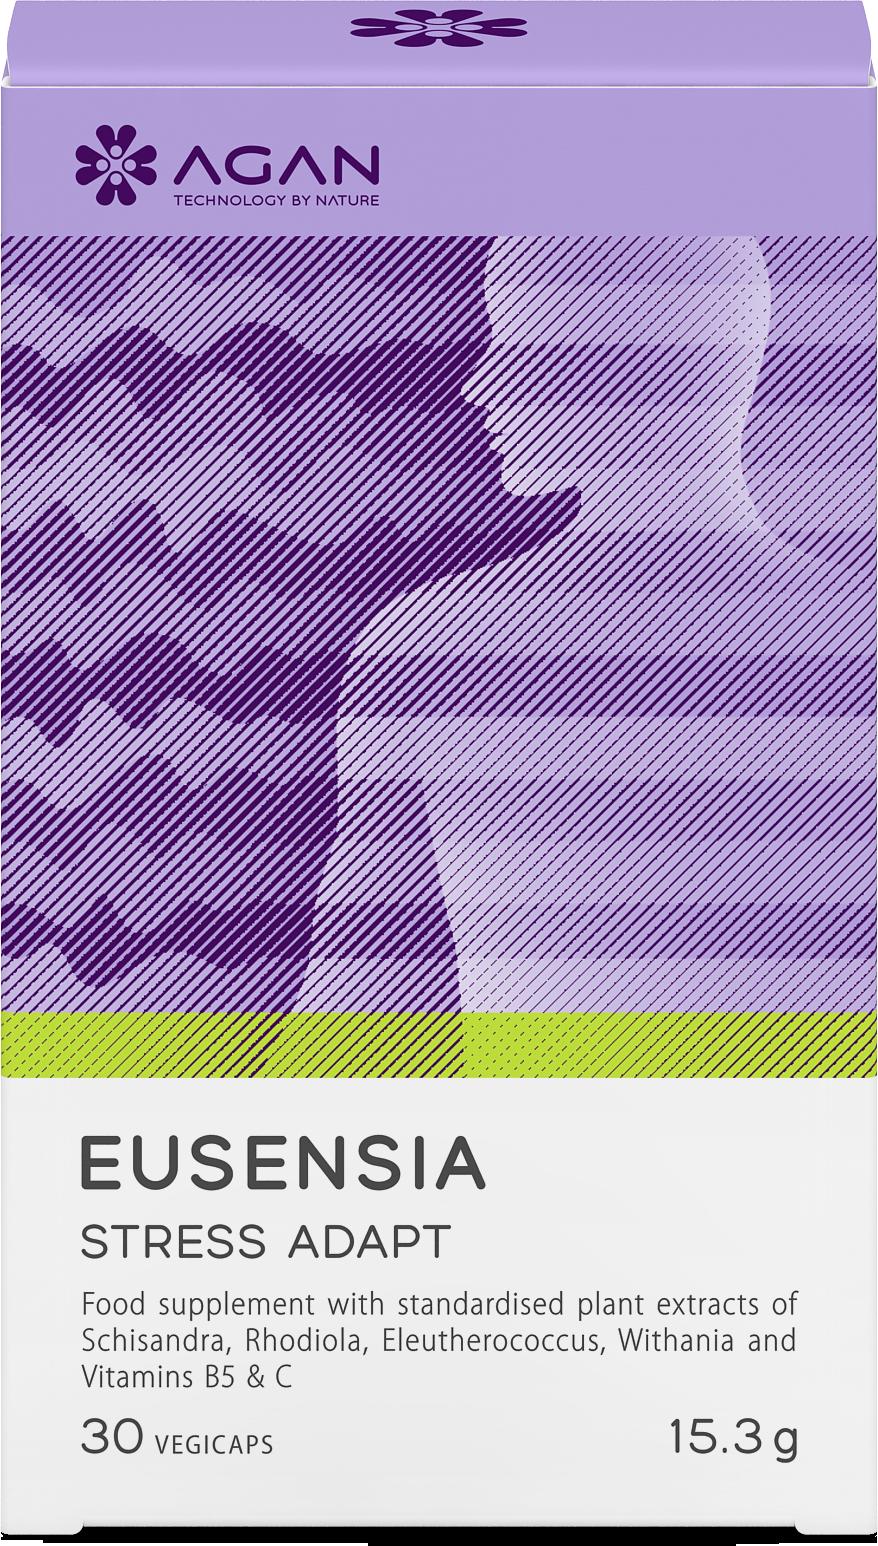 EUSENSIA STRESS ADAPT